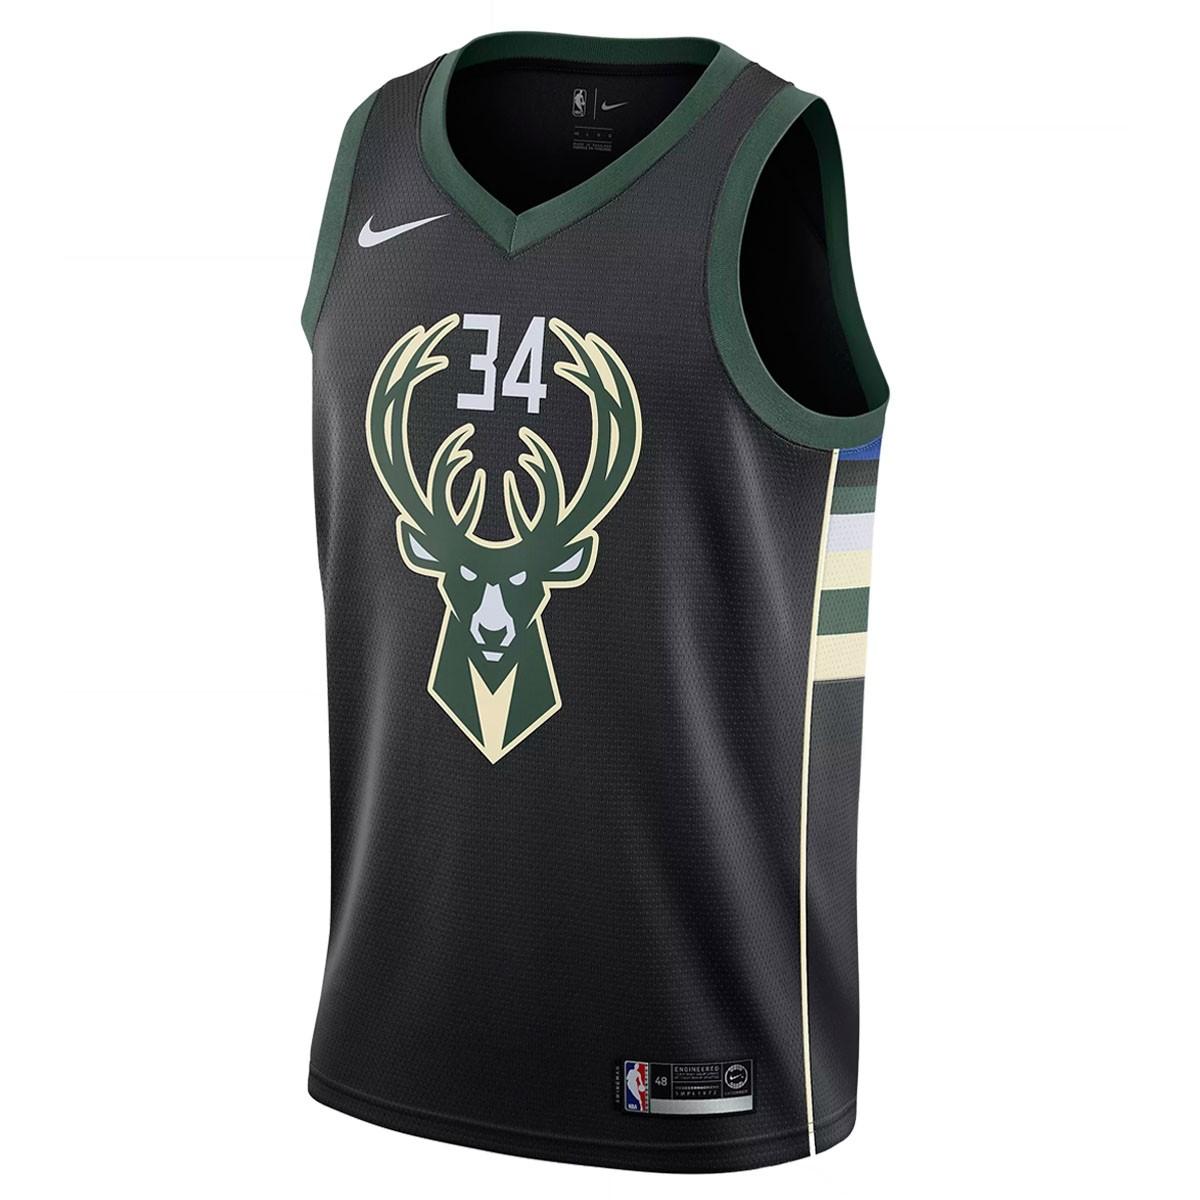 Nike Junior NBA MB Swingman Jersey Antetokounmpo 'Statement Edition'